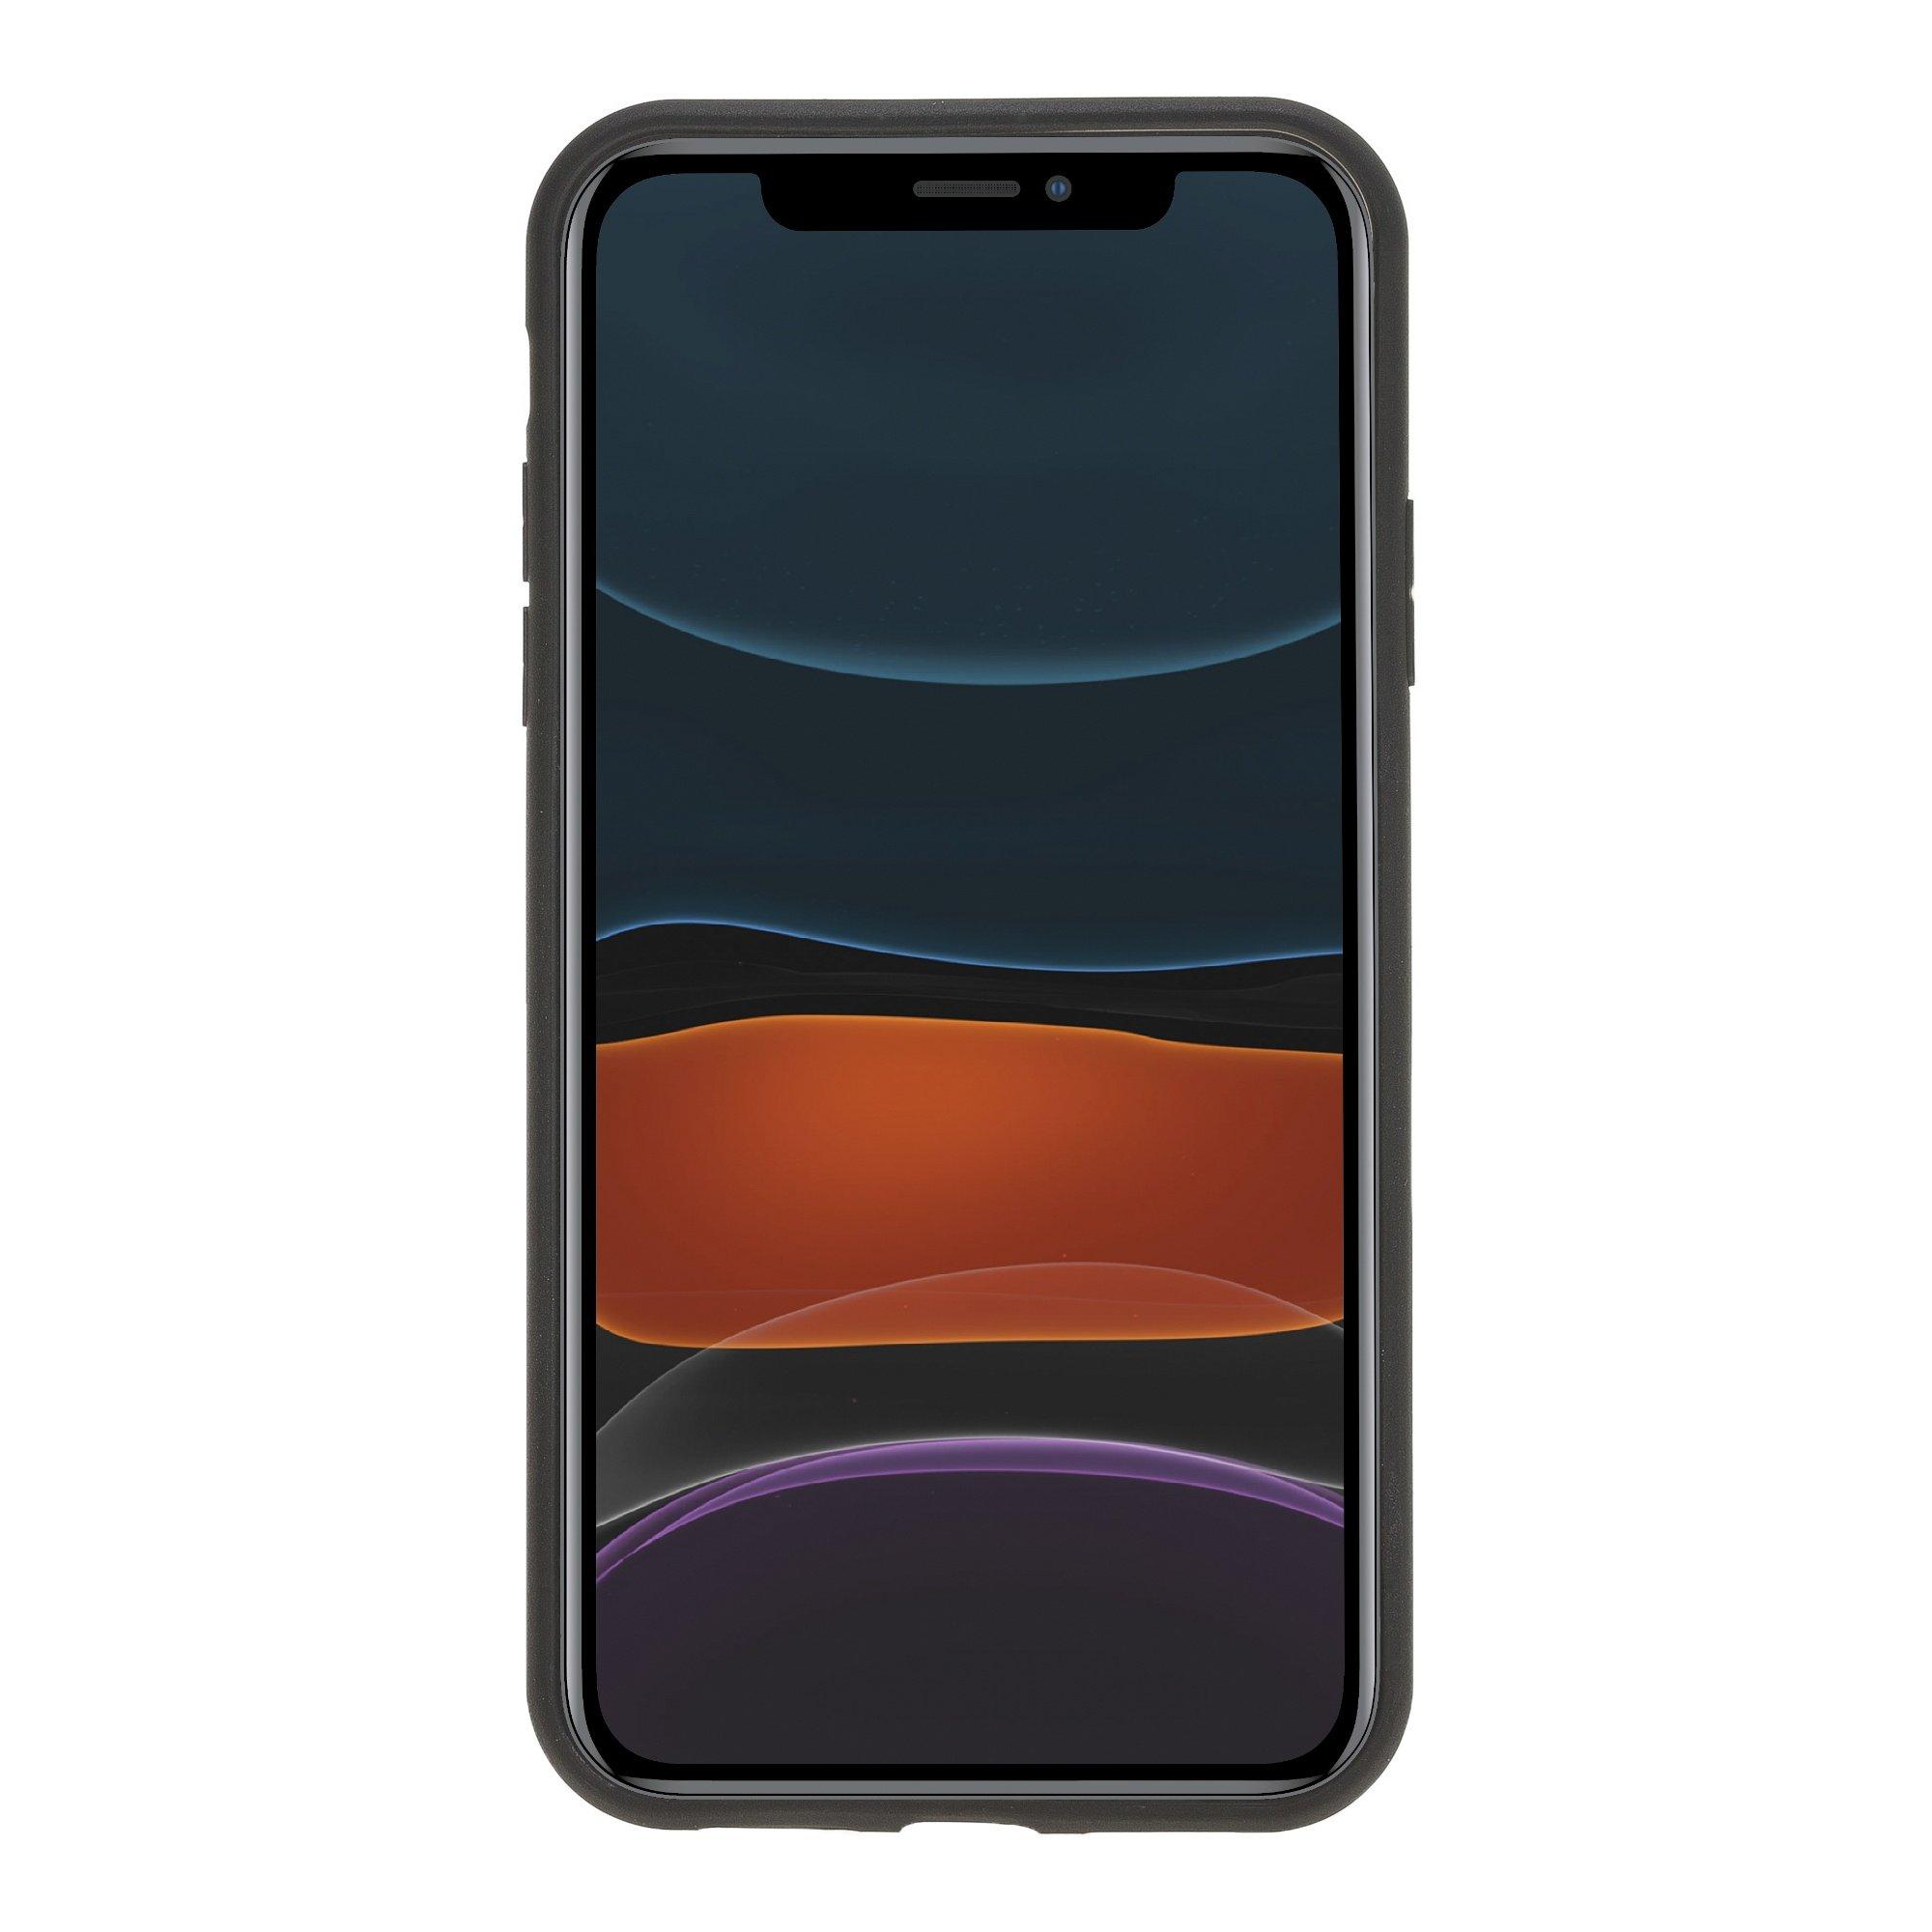 Solo Pelle Lederhülle für das iPhone 11 (XI) 6.1 Zoll Stanford (Carbonprägung)